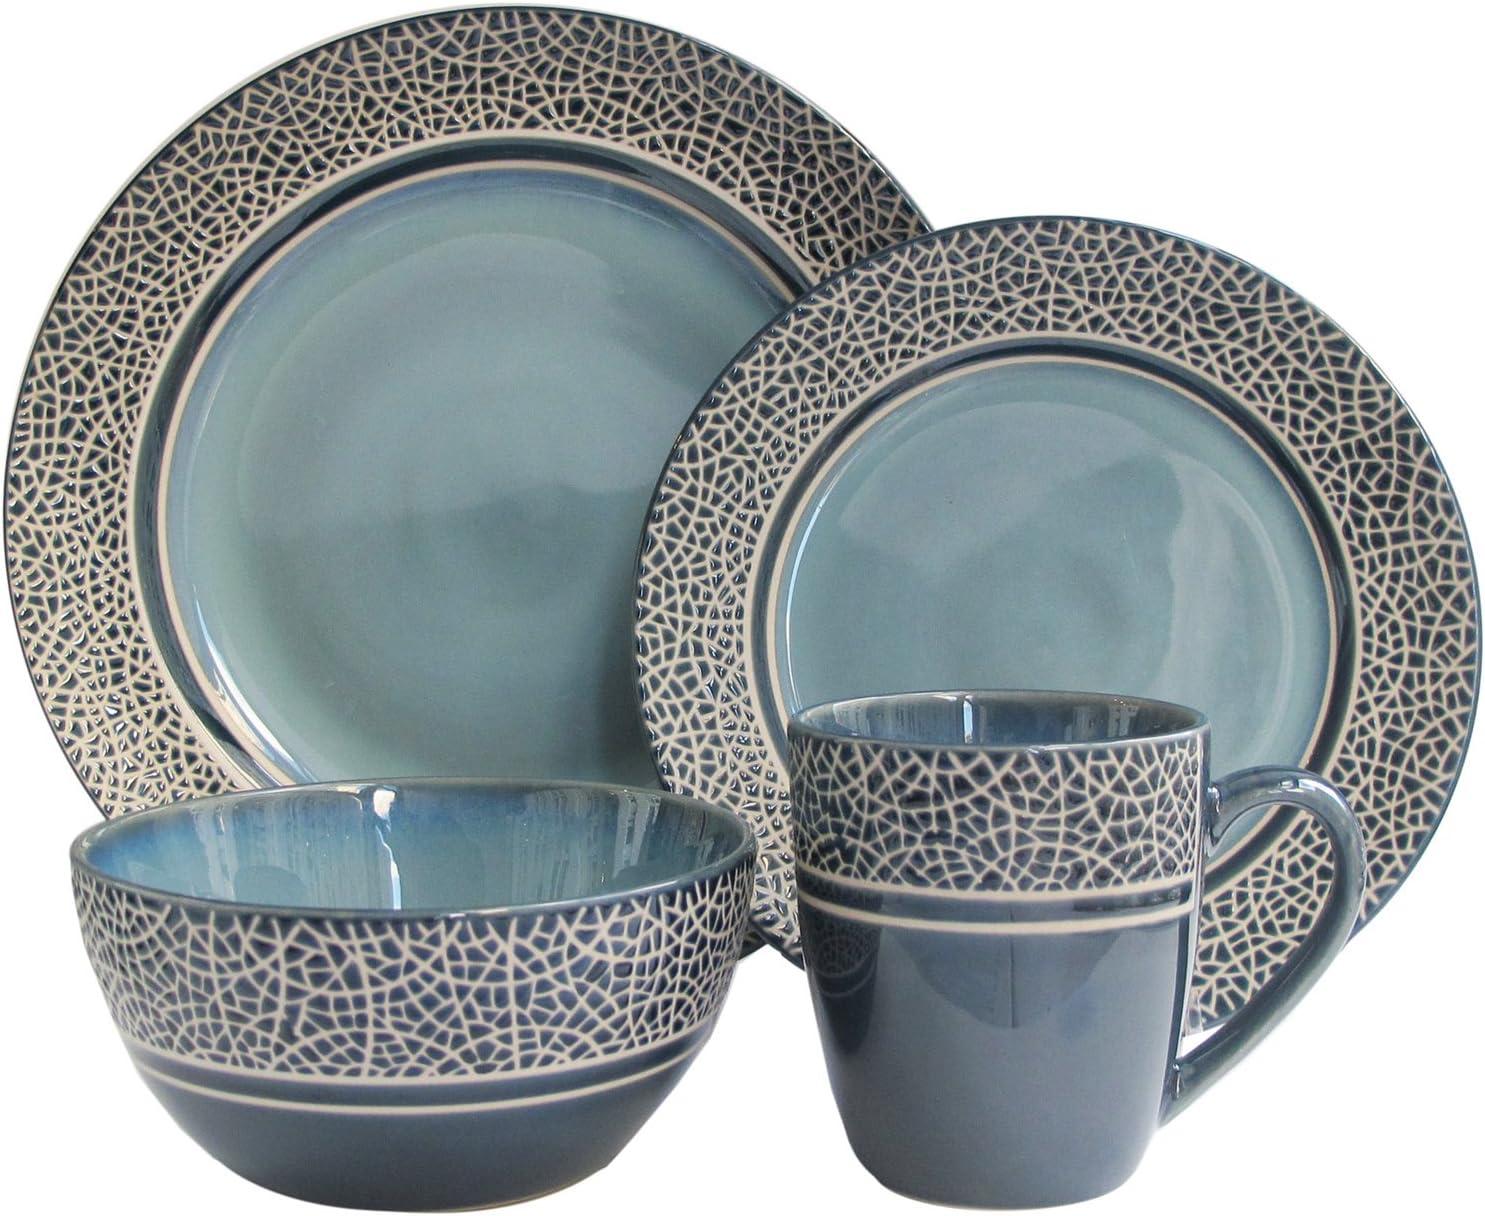 American Atelier Markham Dinnerware Set  sc 1 st  Amazon.com & Amazon.com: Dinnerware Sets: Home \u0026 Kitchen